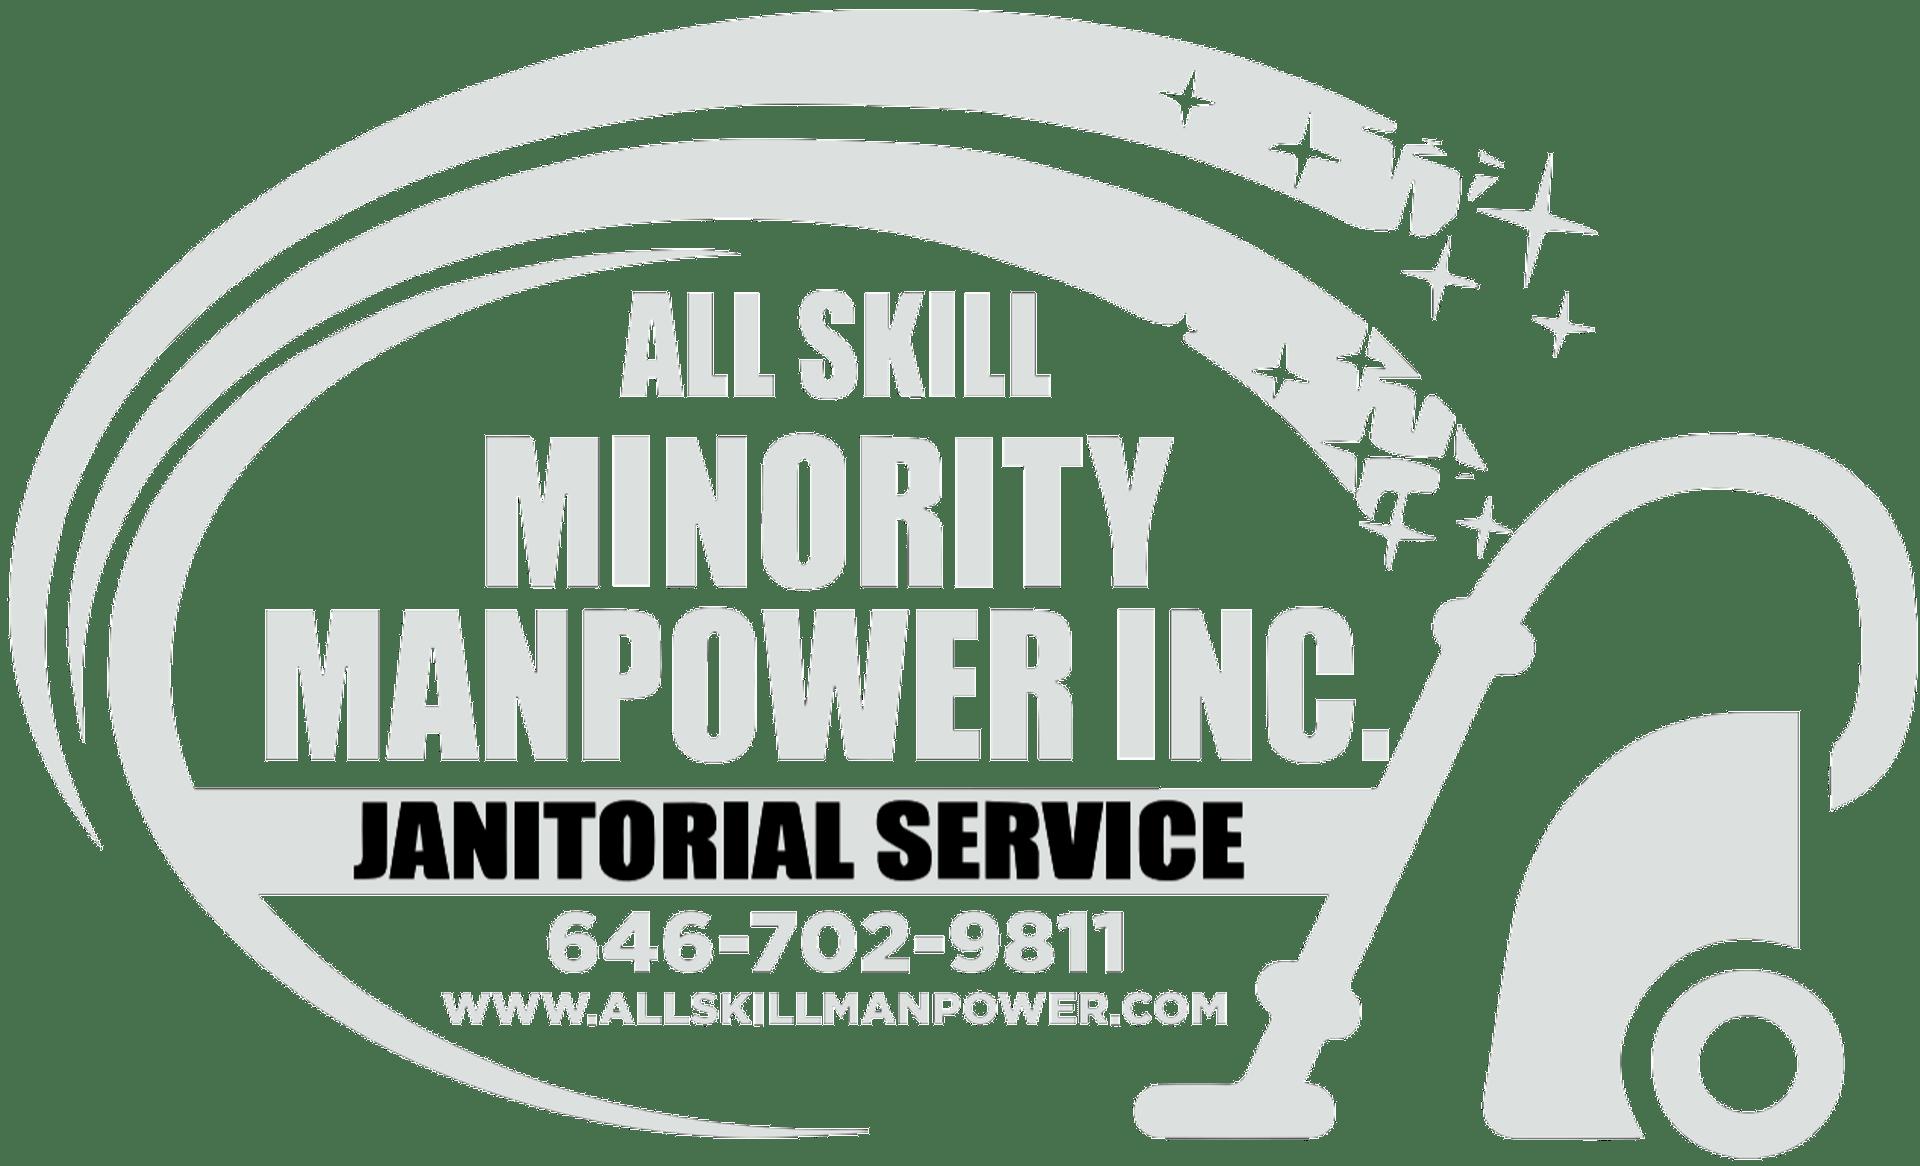 ALL SKILL MINORITY MANPOWER INC